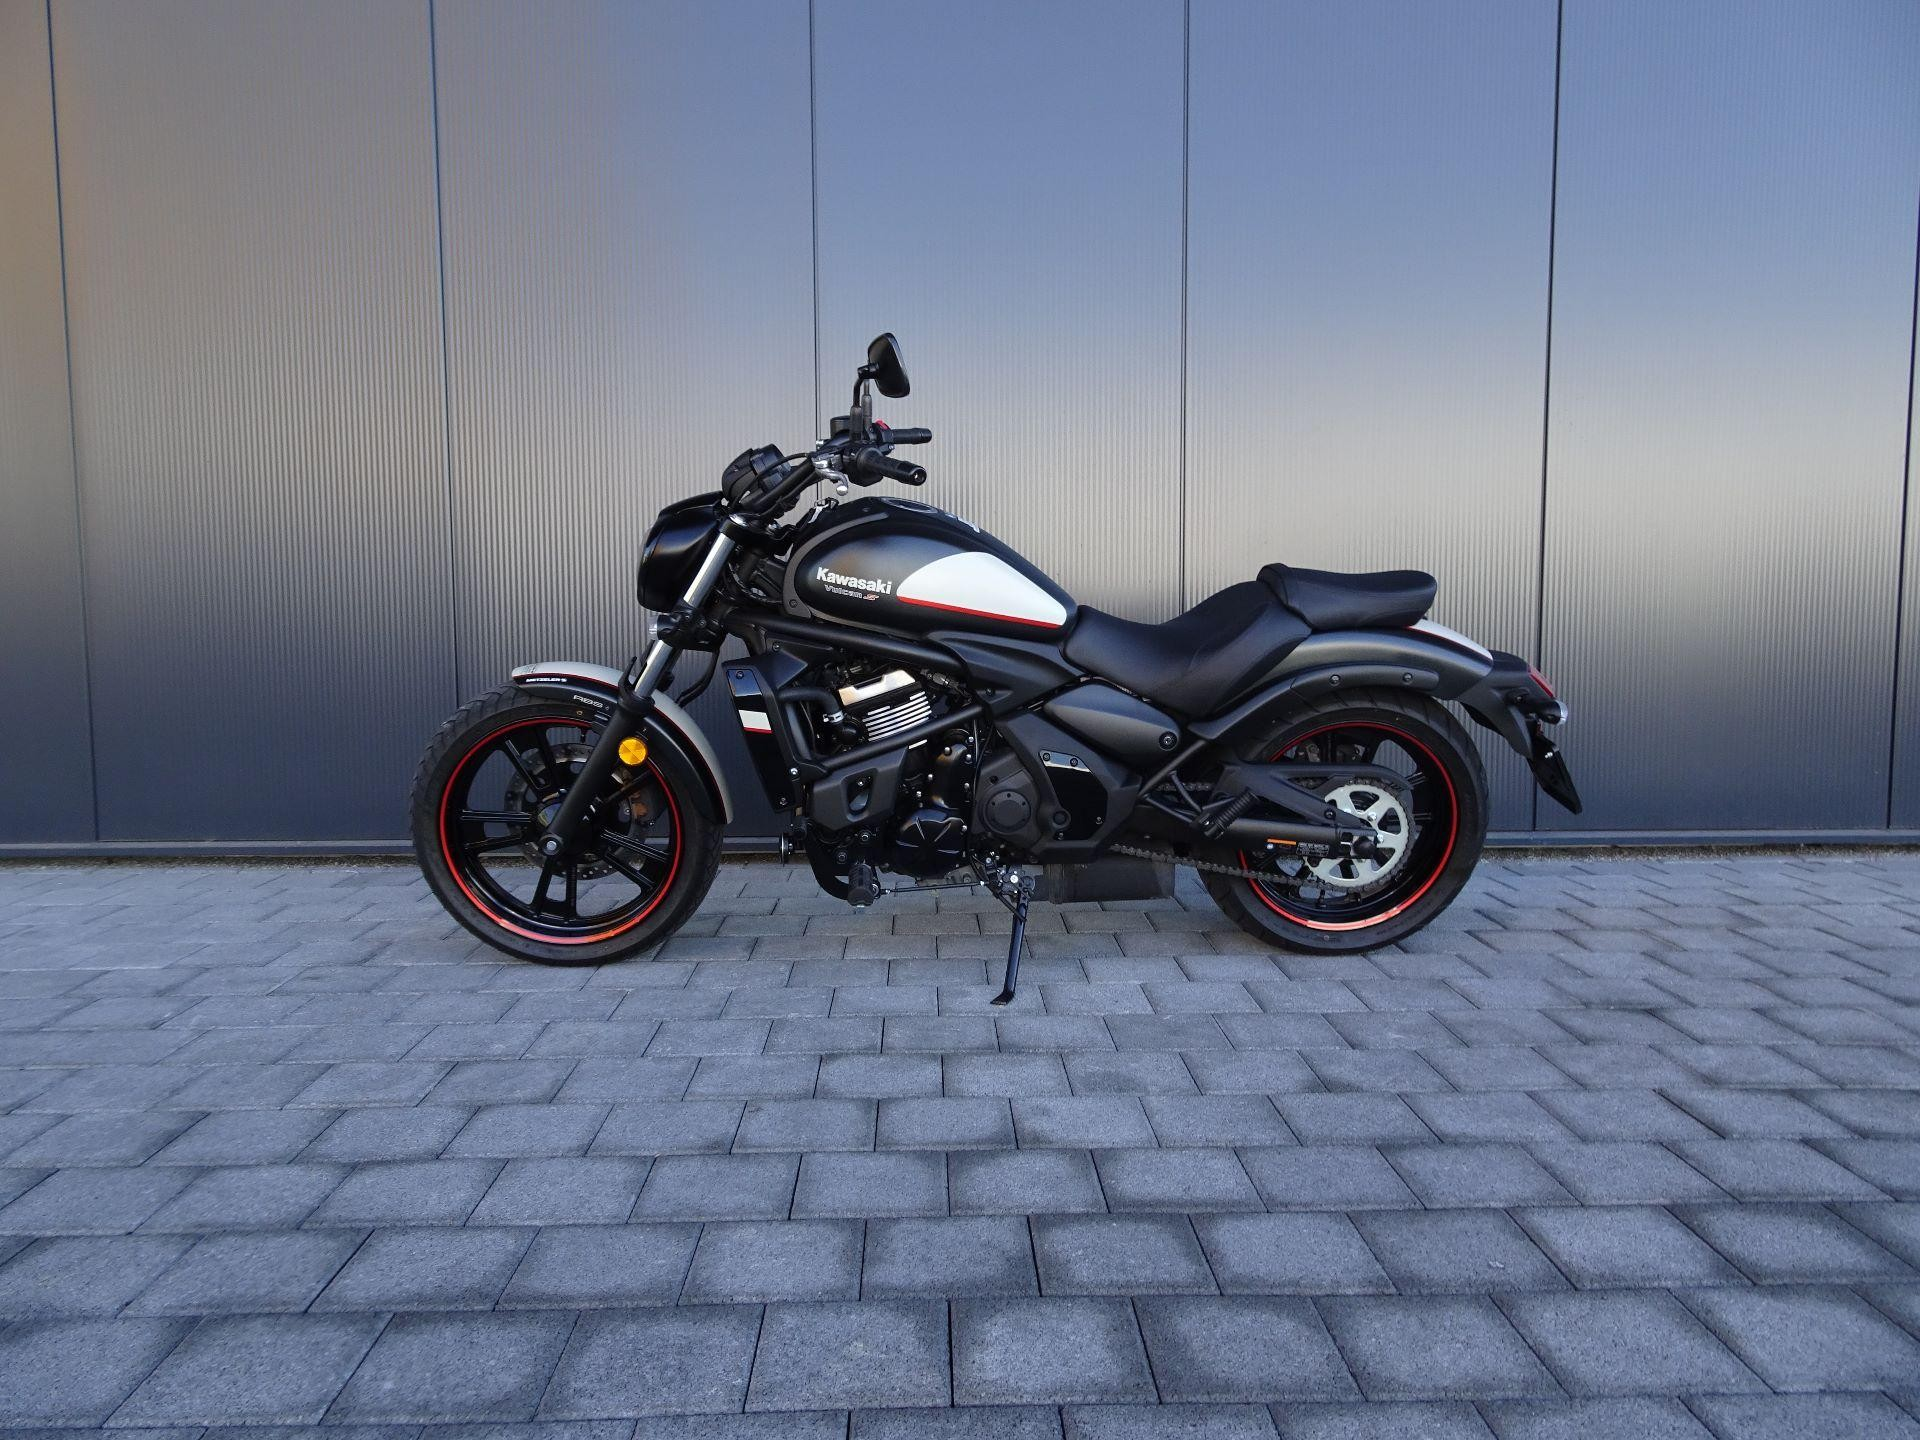 moto occasions acheter kawasaki vulcan s 650 abs keller motos ag siggenthal station. Black Bedroom Furniture Sets. Home Design Ideas